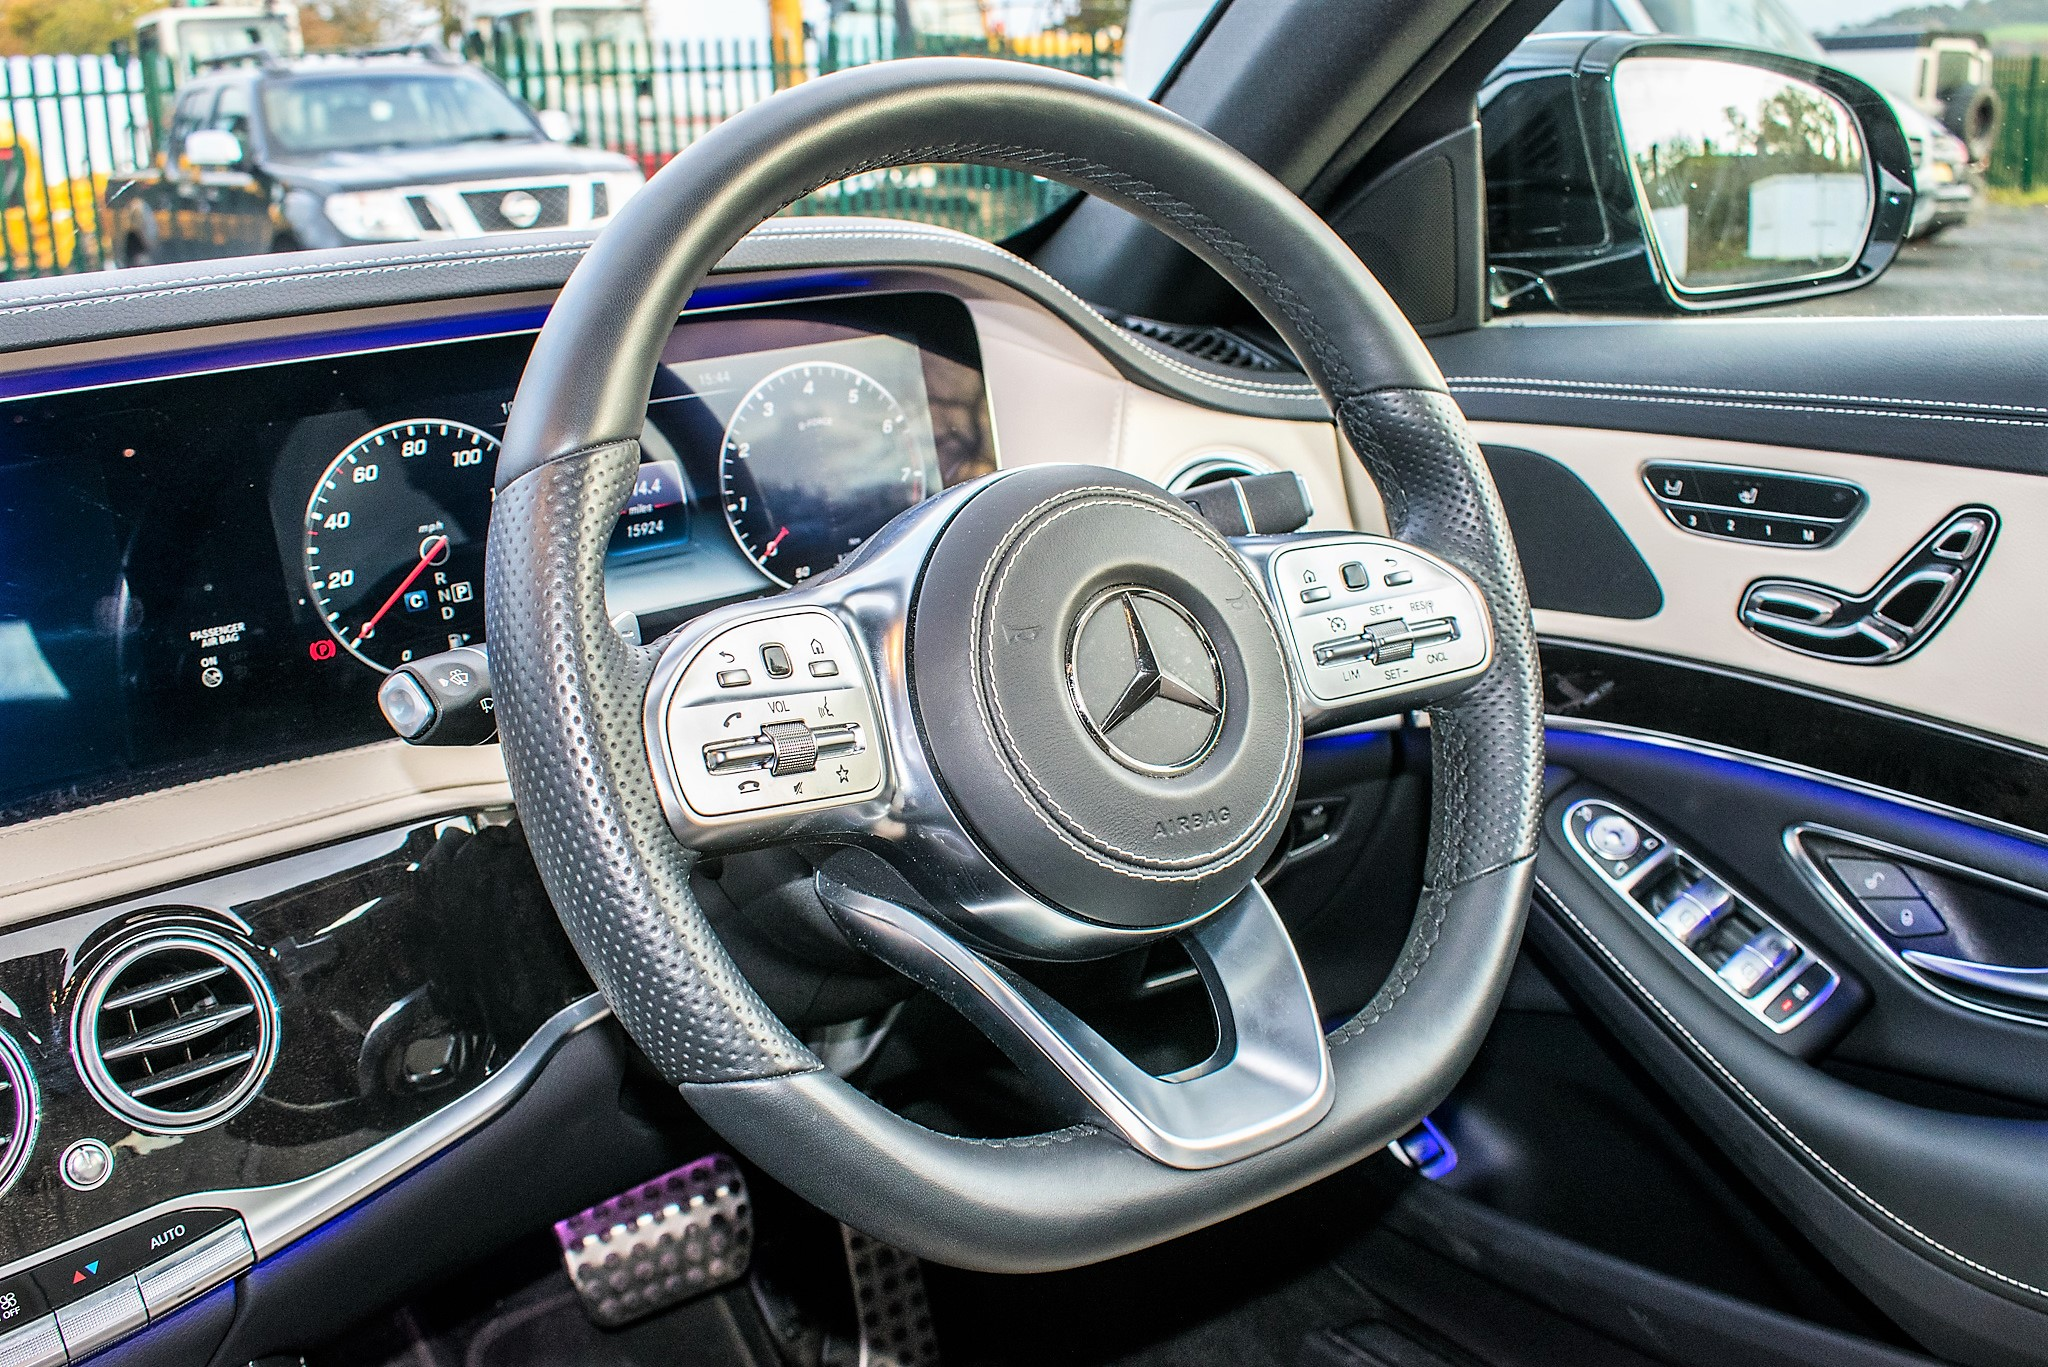 Mercedes Benz S450 L AMG Line Executive auto petrol 4 door saloon car Registration Number: FX68 - Image 32 of 33